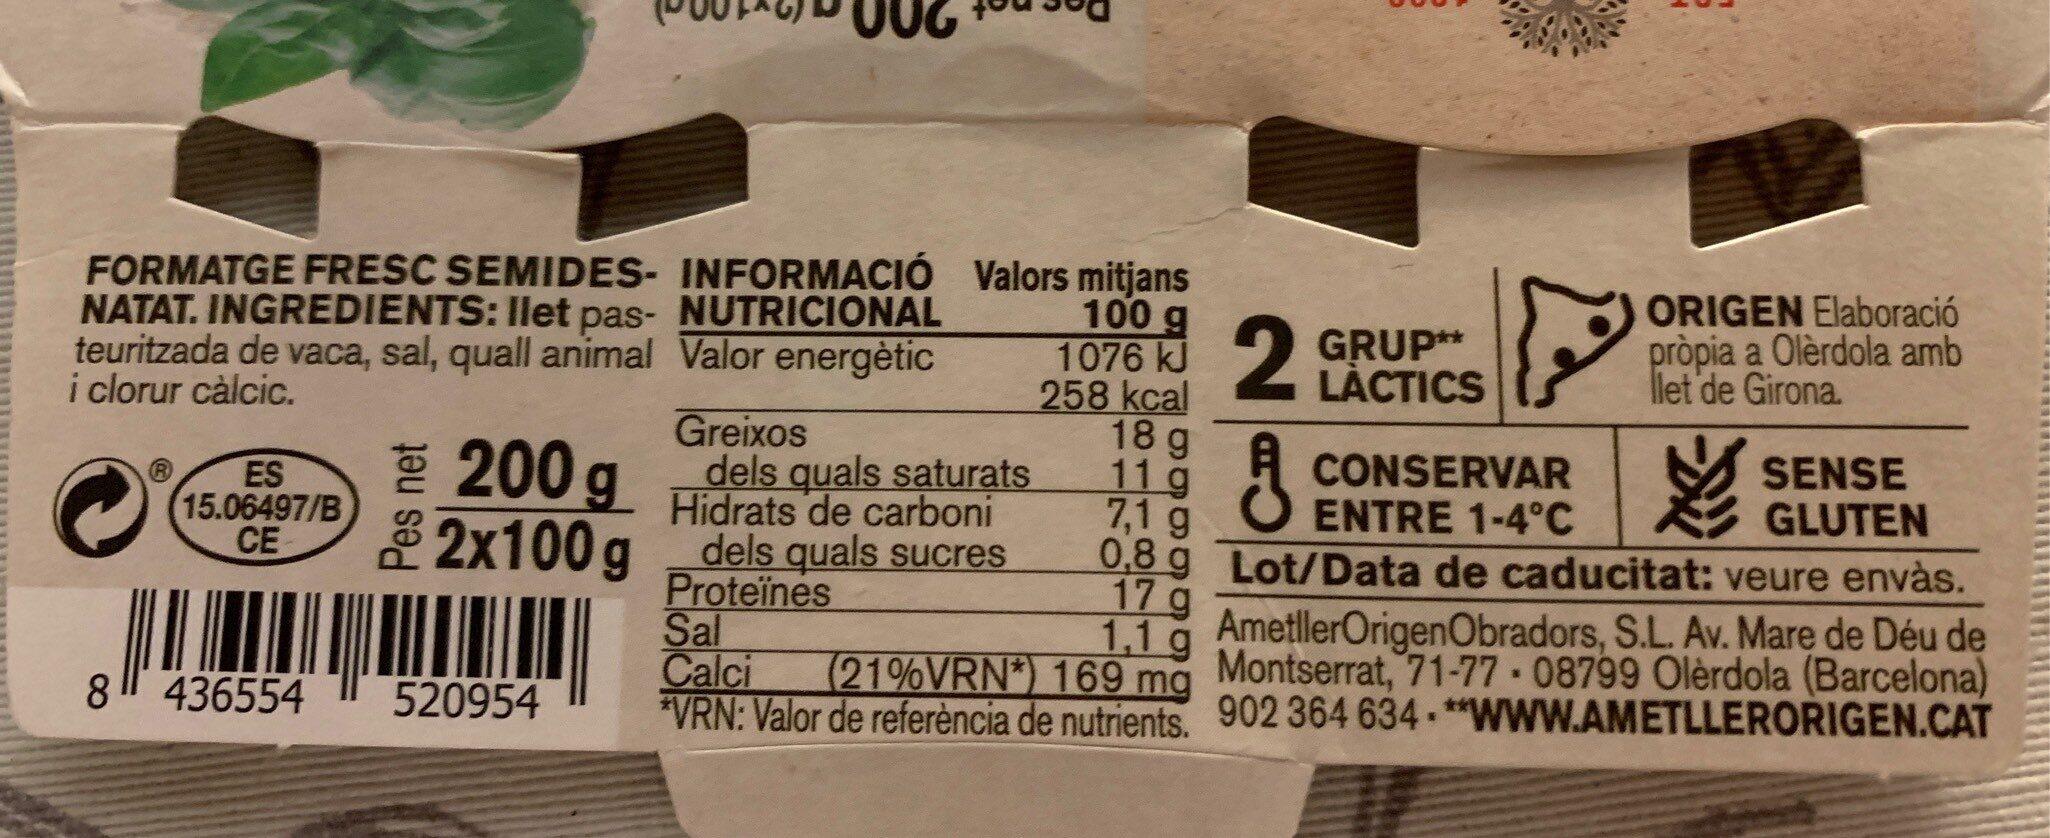 Formatge fresc - Información nutricional